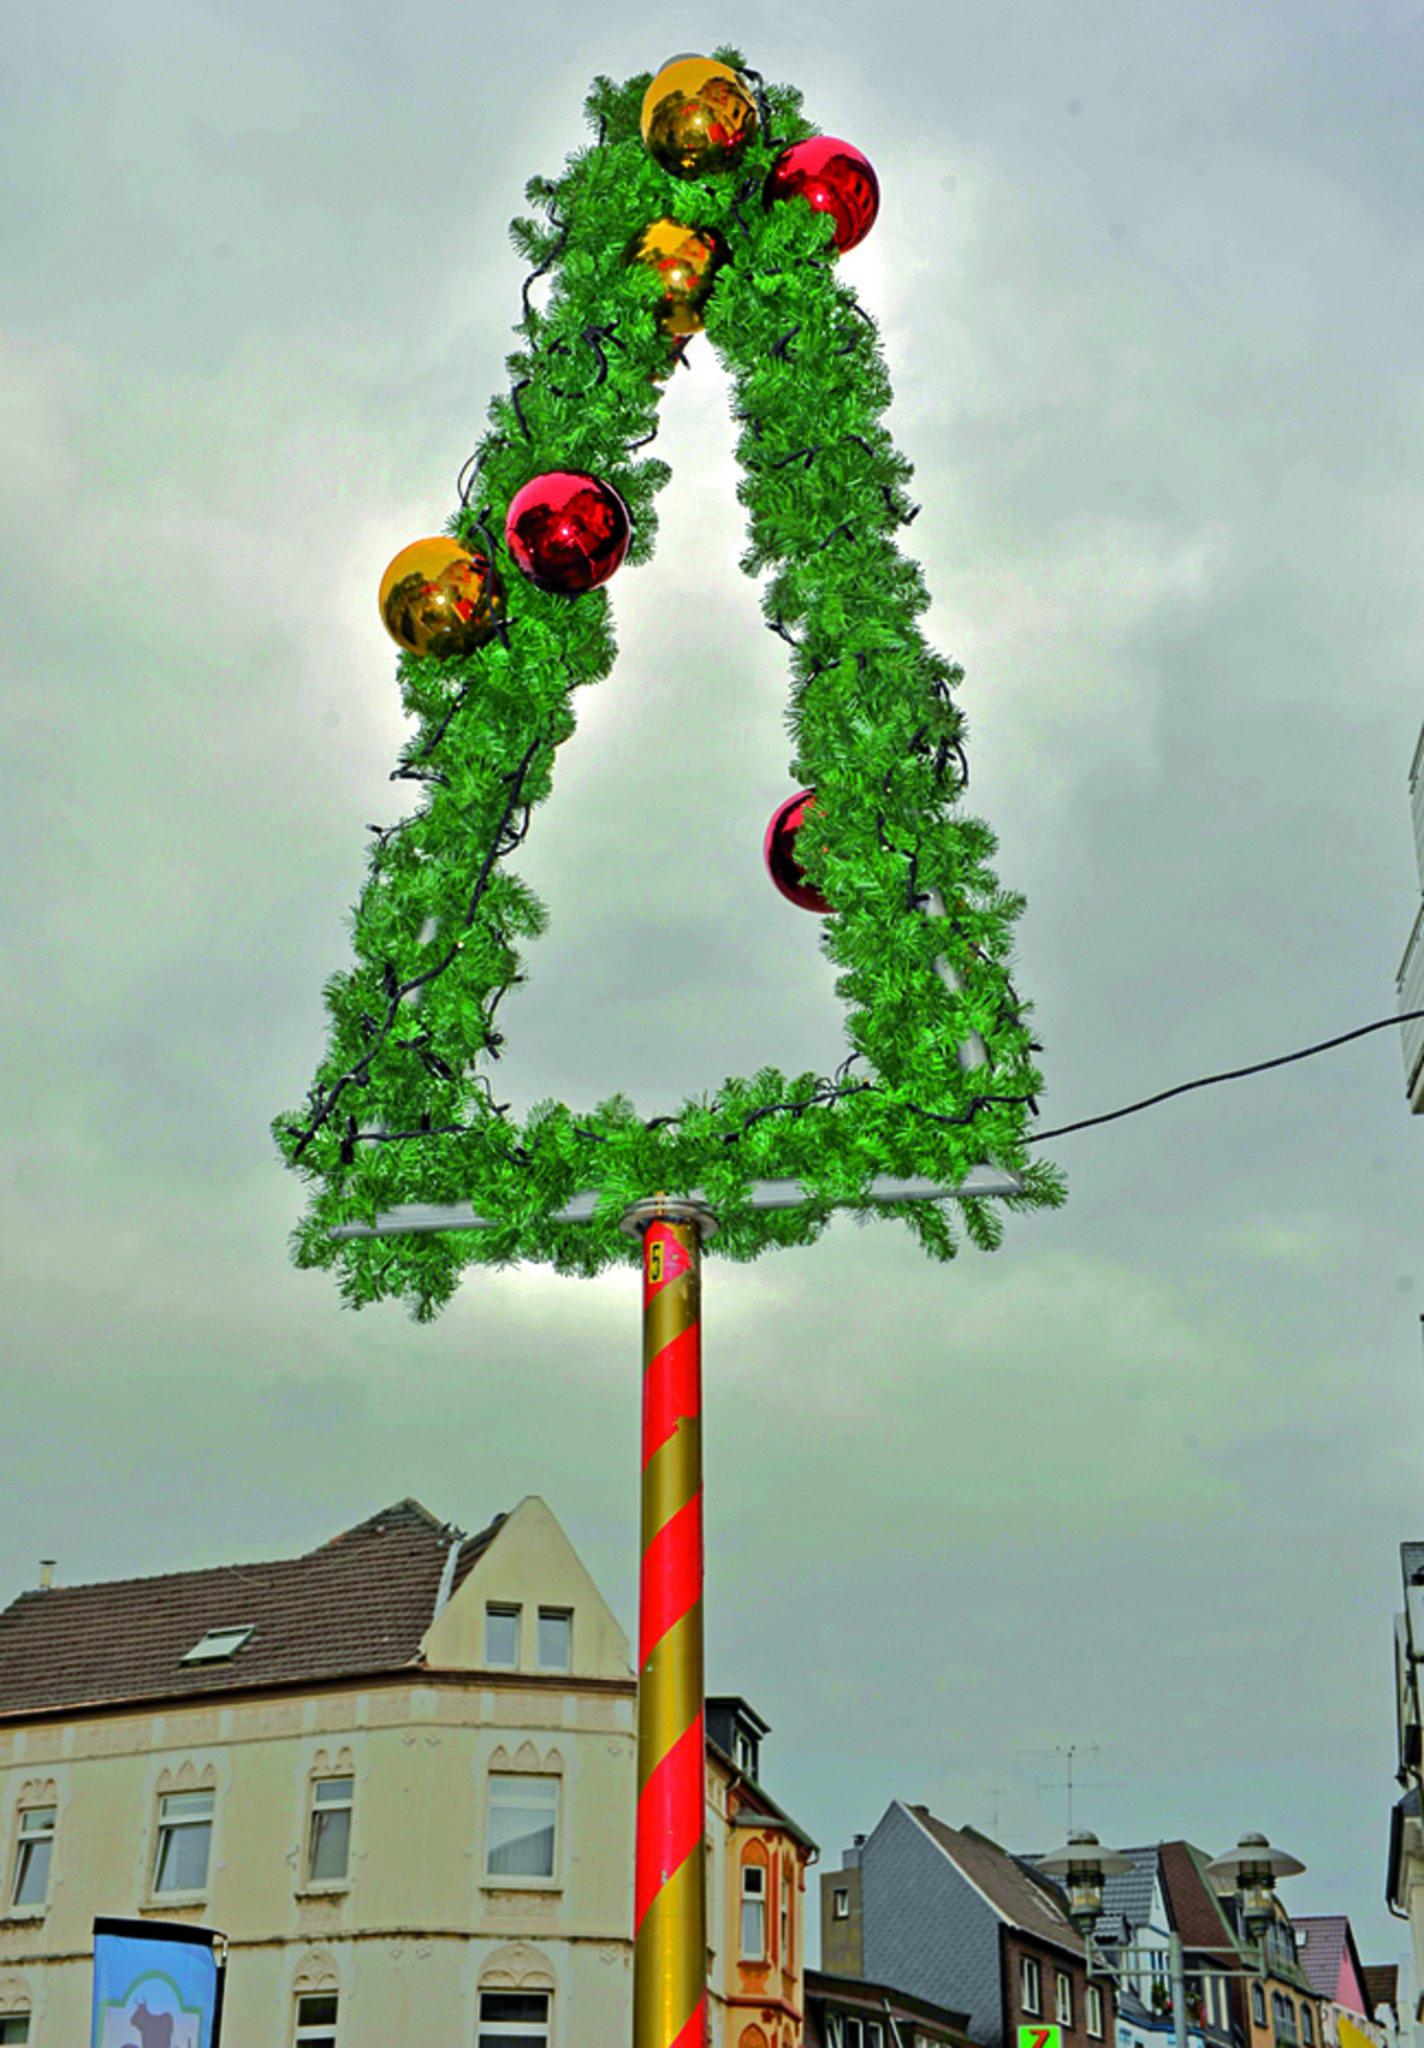 Weihnachtsbeleuchtung Xxl.Neue Weihnachtsbeleuchtung In Sterkrade Oberhausen